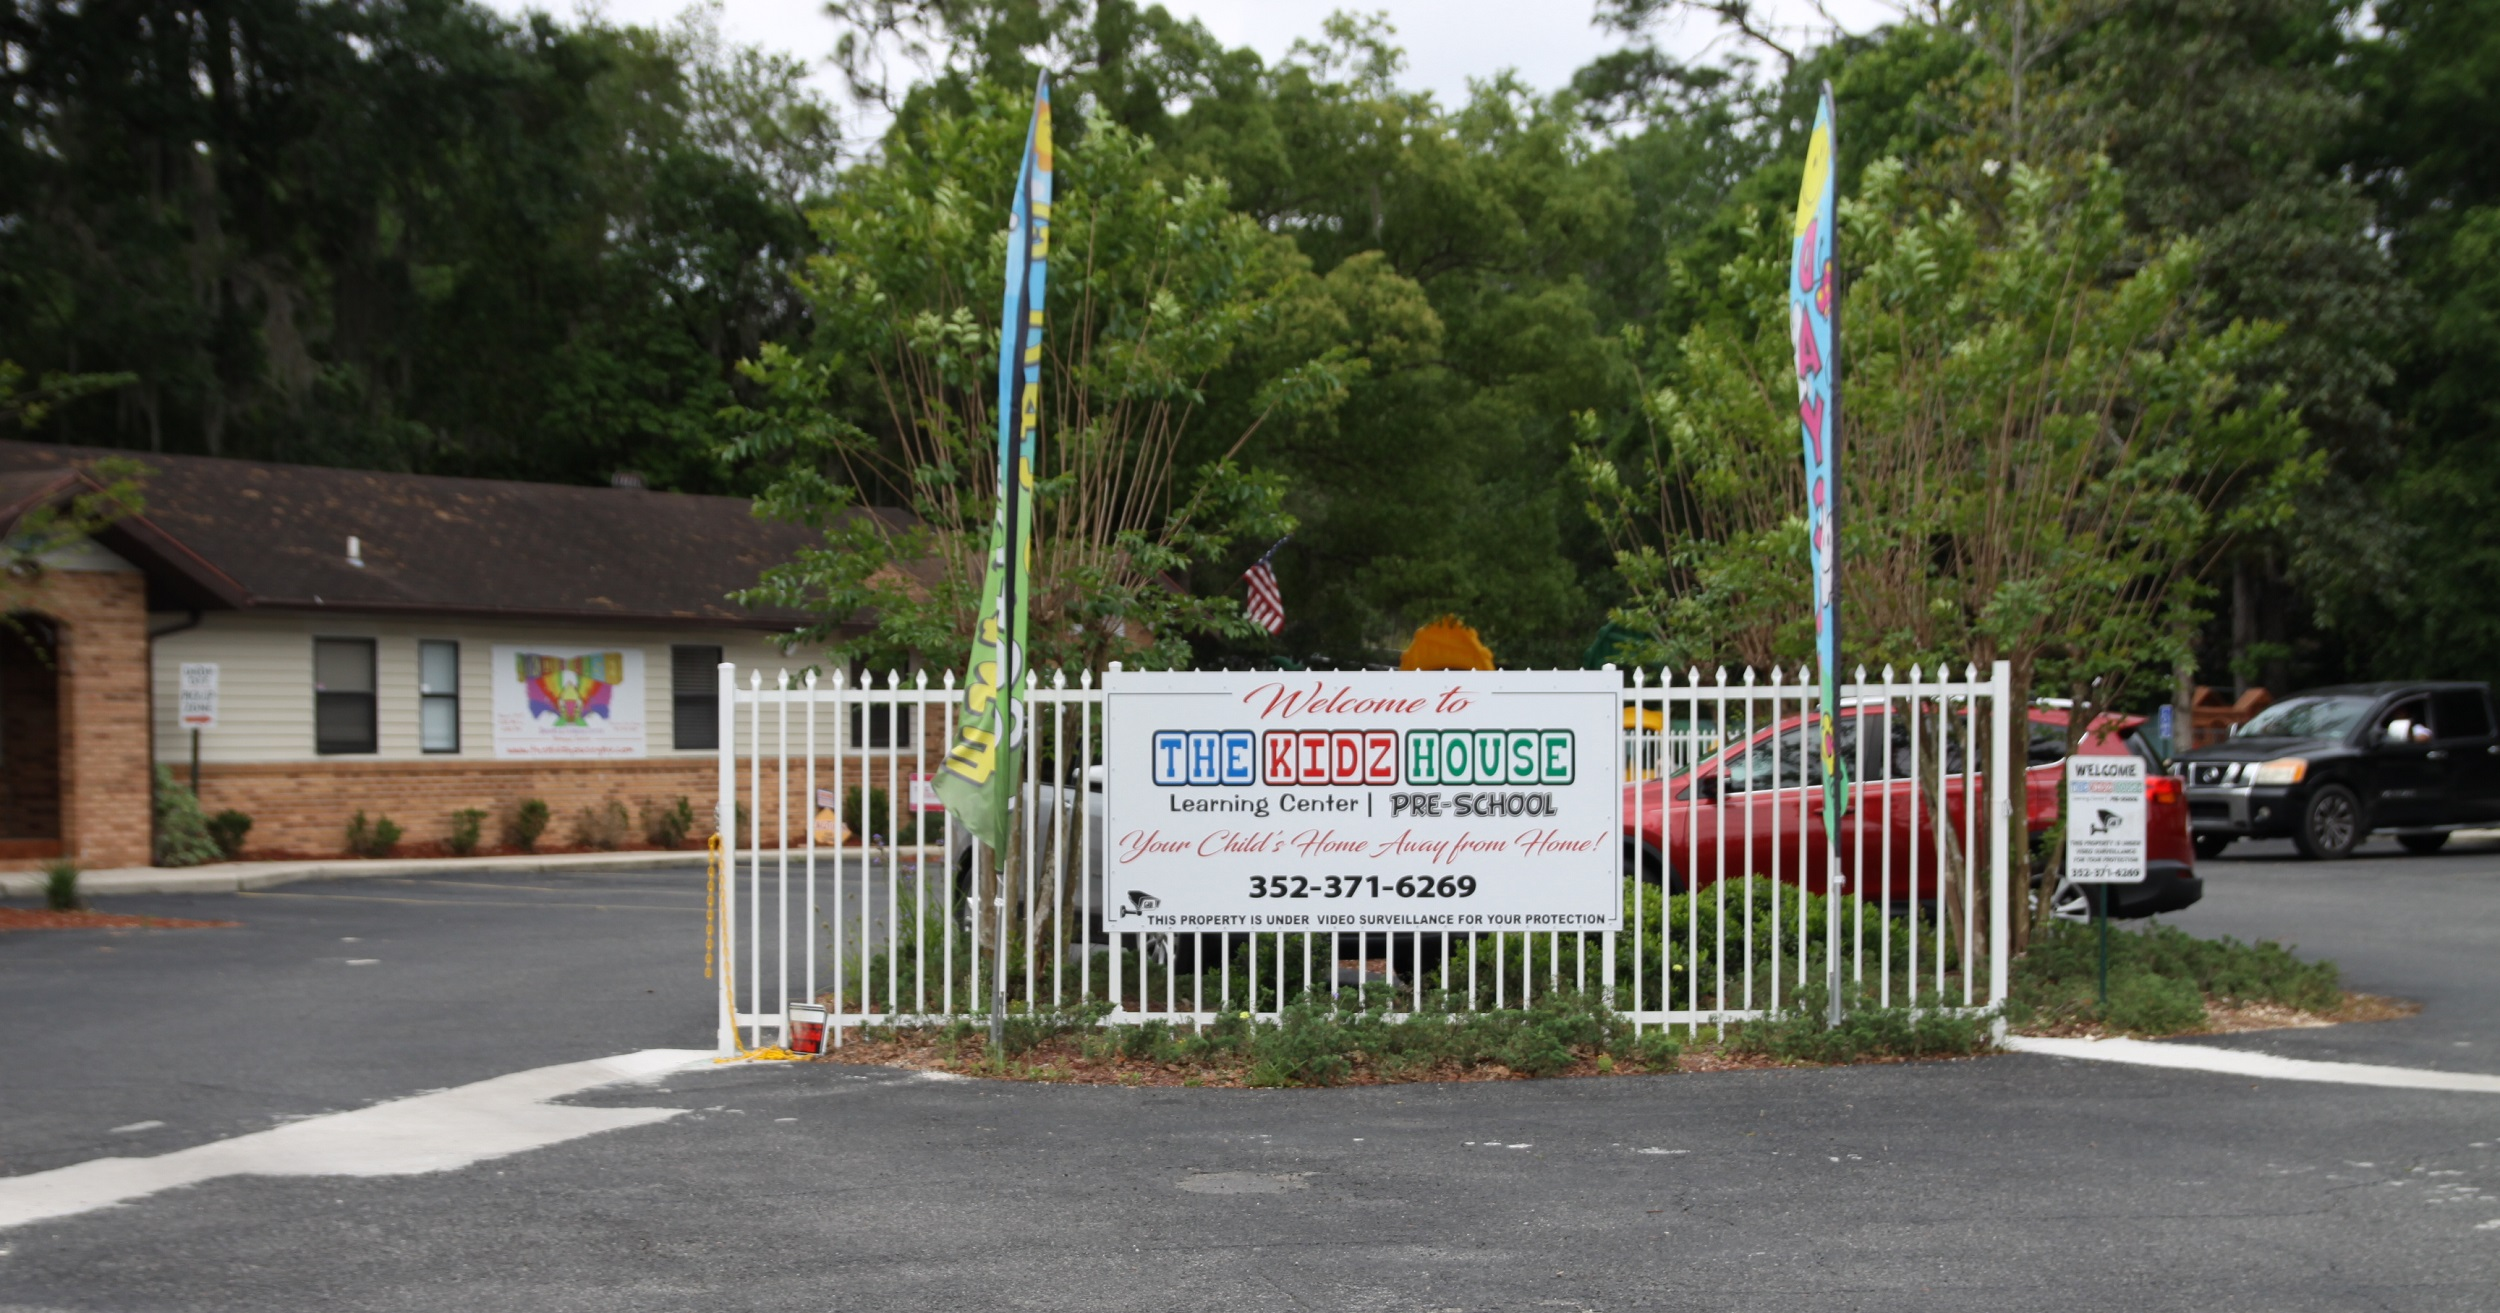 The Kidz House Daycare Facility